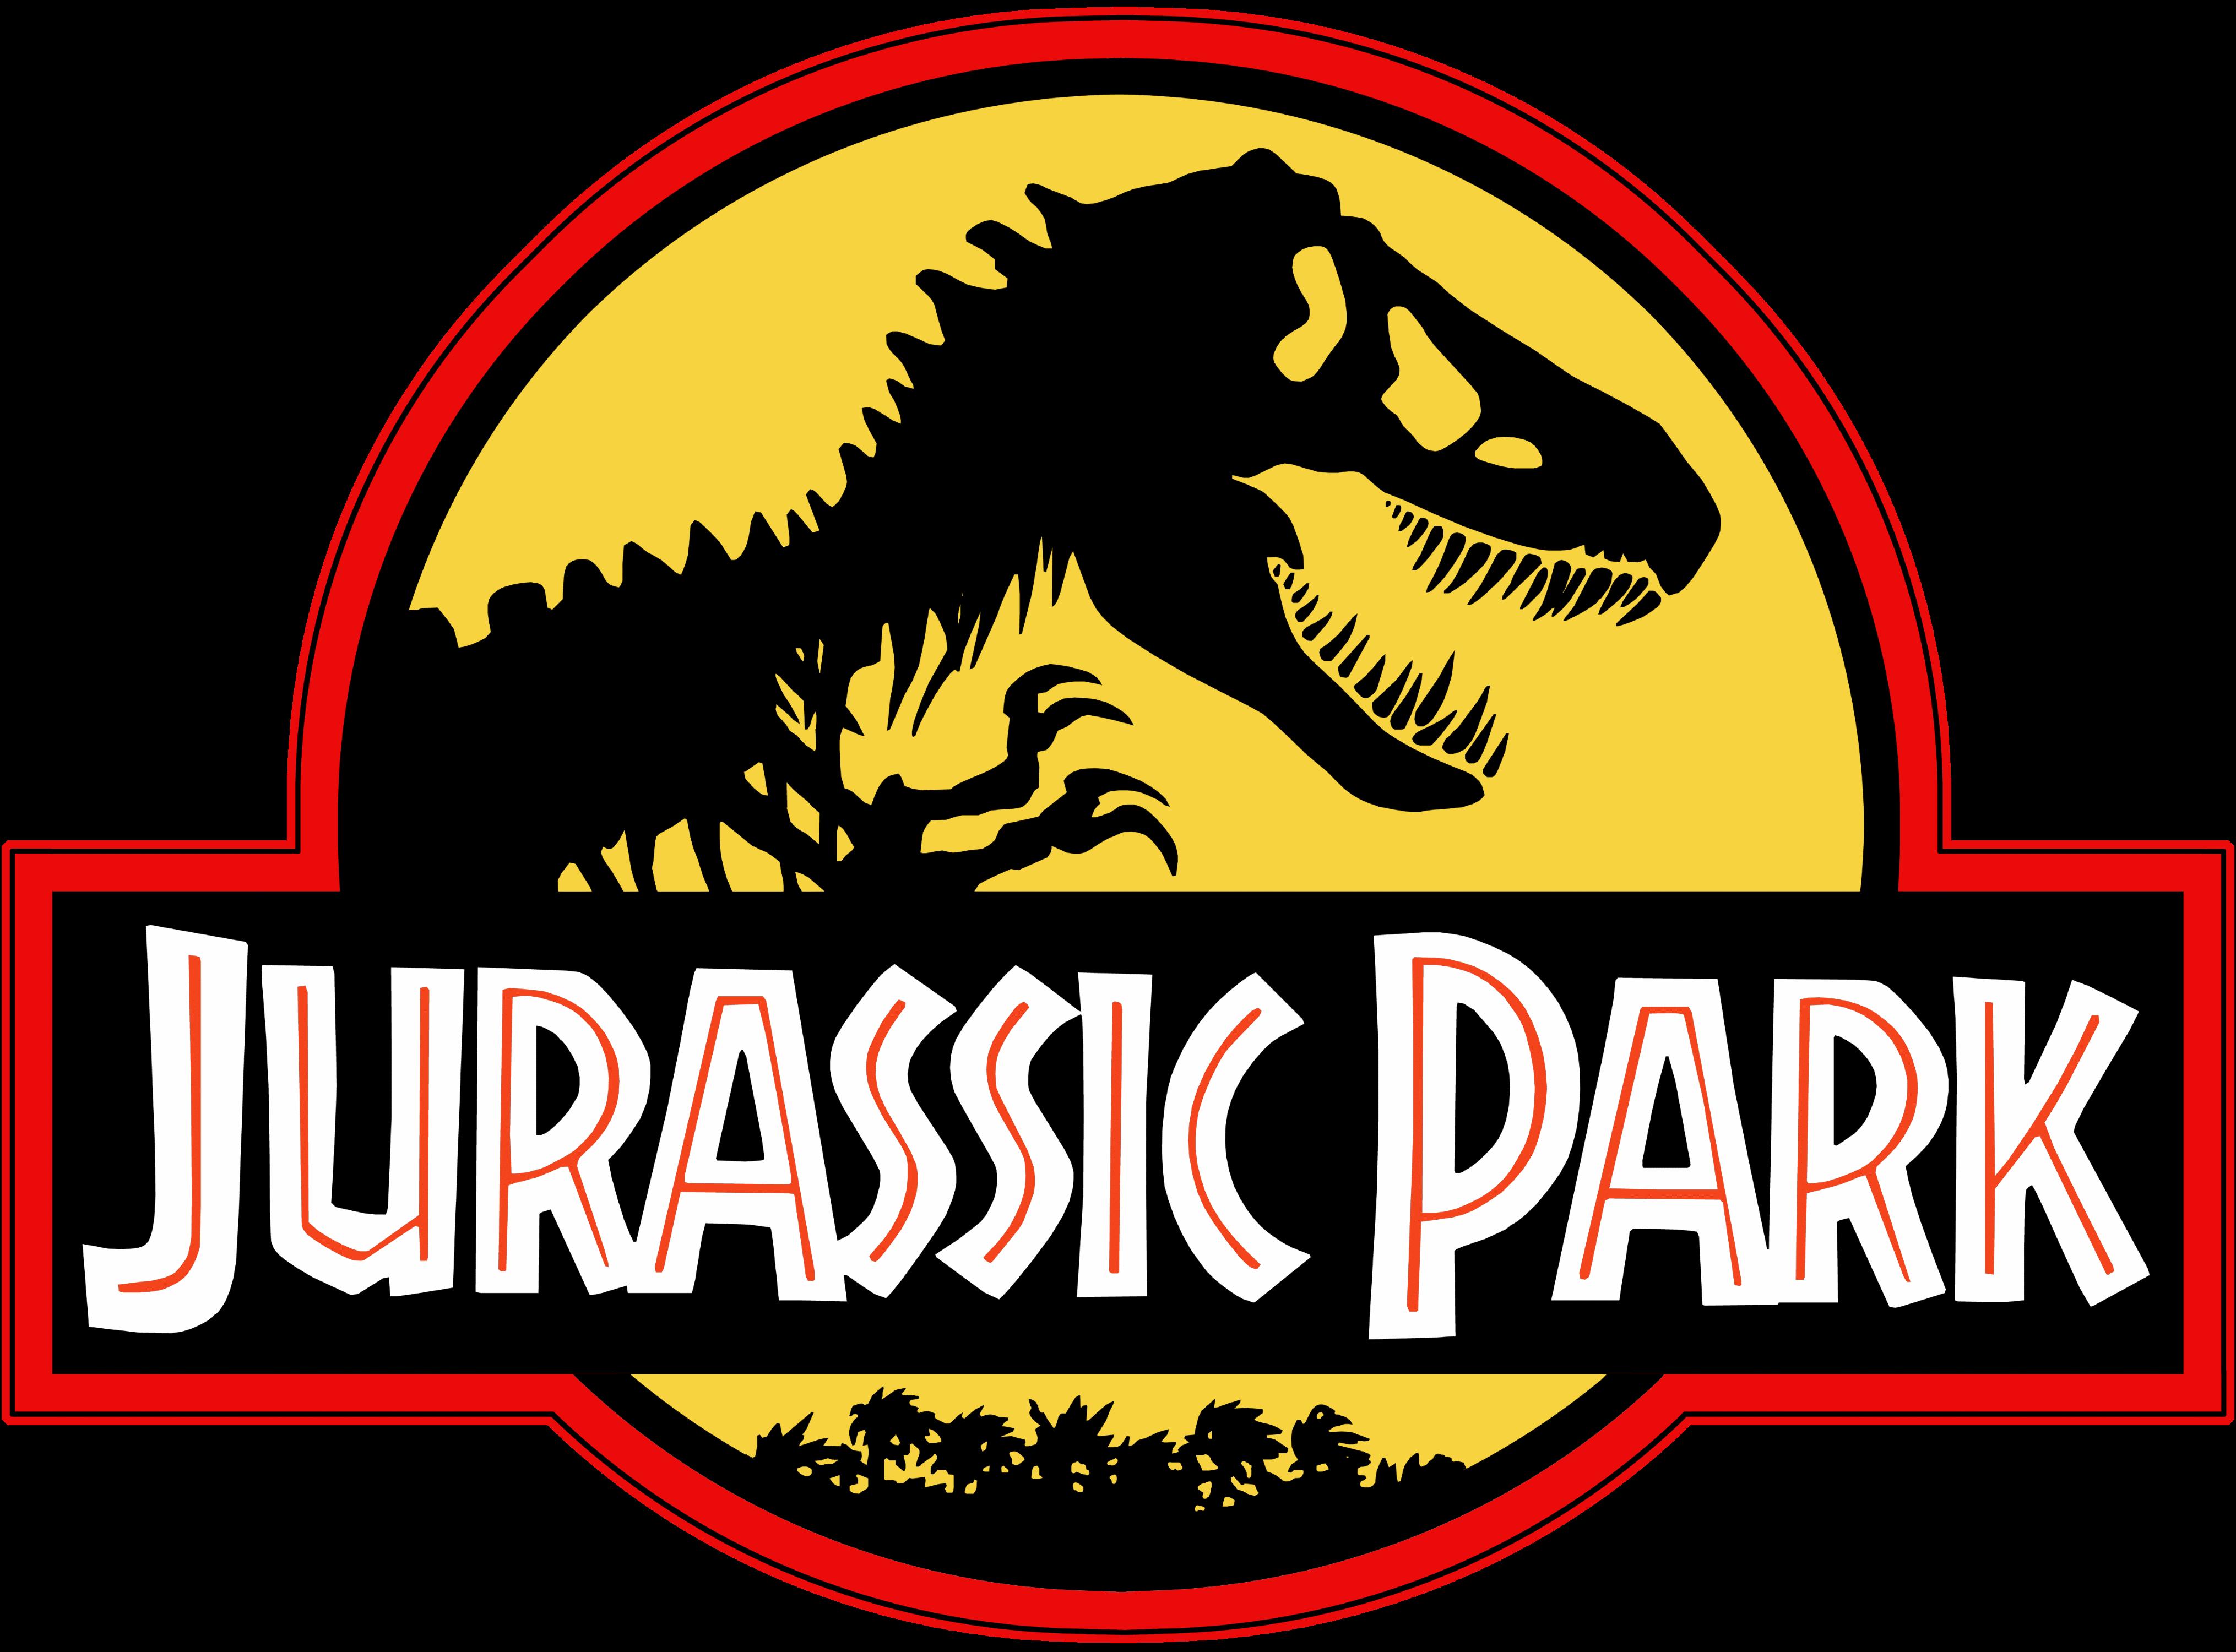 Jurassic Park PNG - 68077